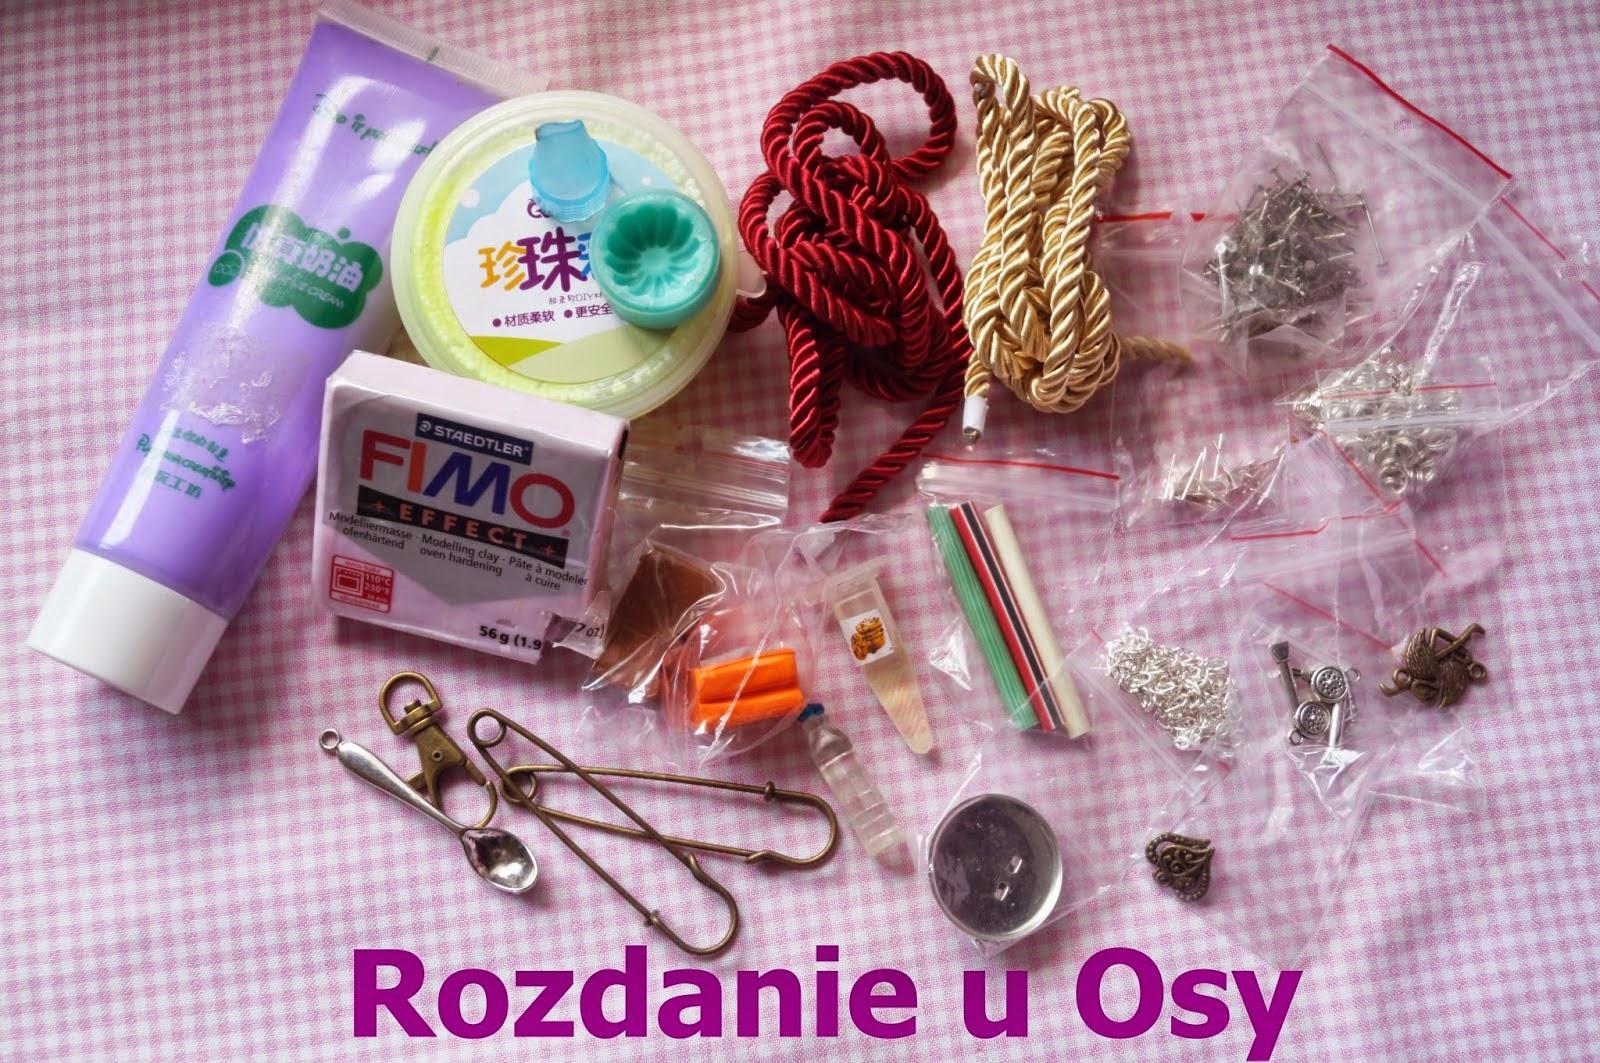 Candy u Osy